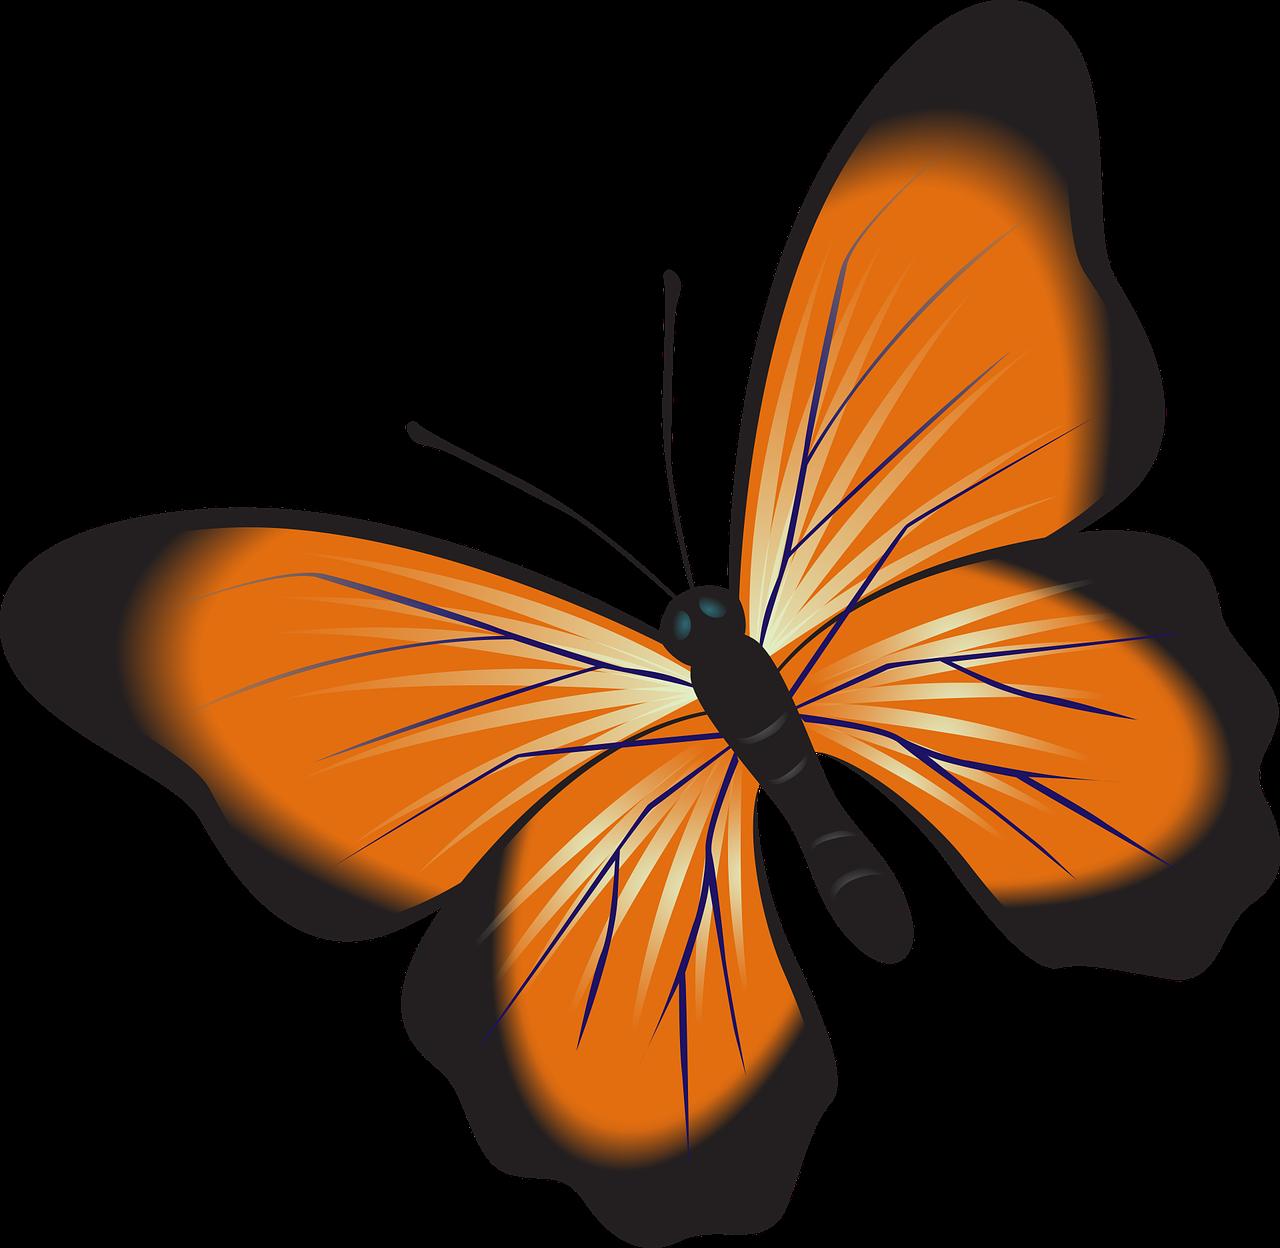 Butterfly Orange Clip Art Free Image On Pixabay